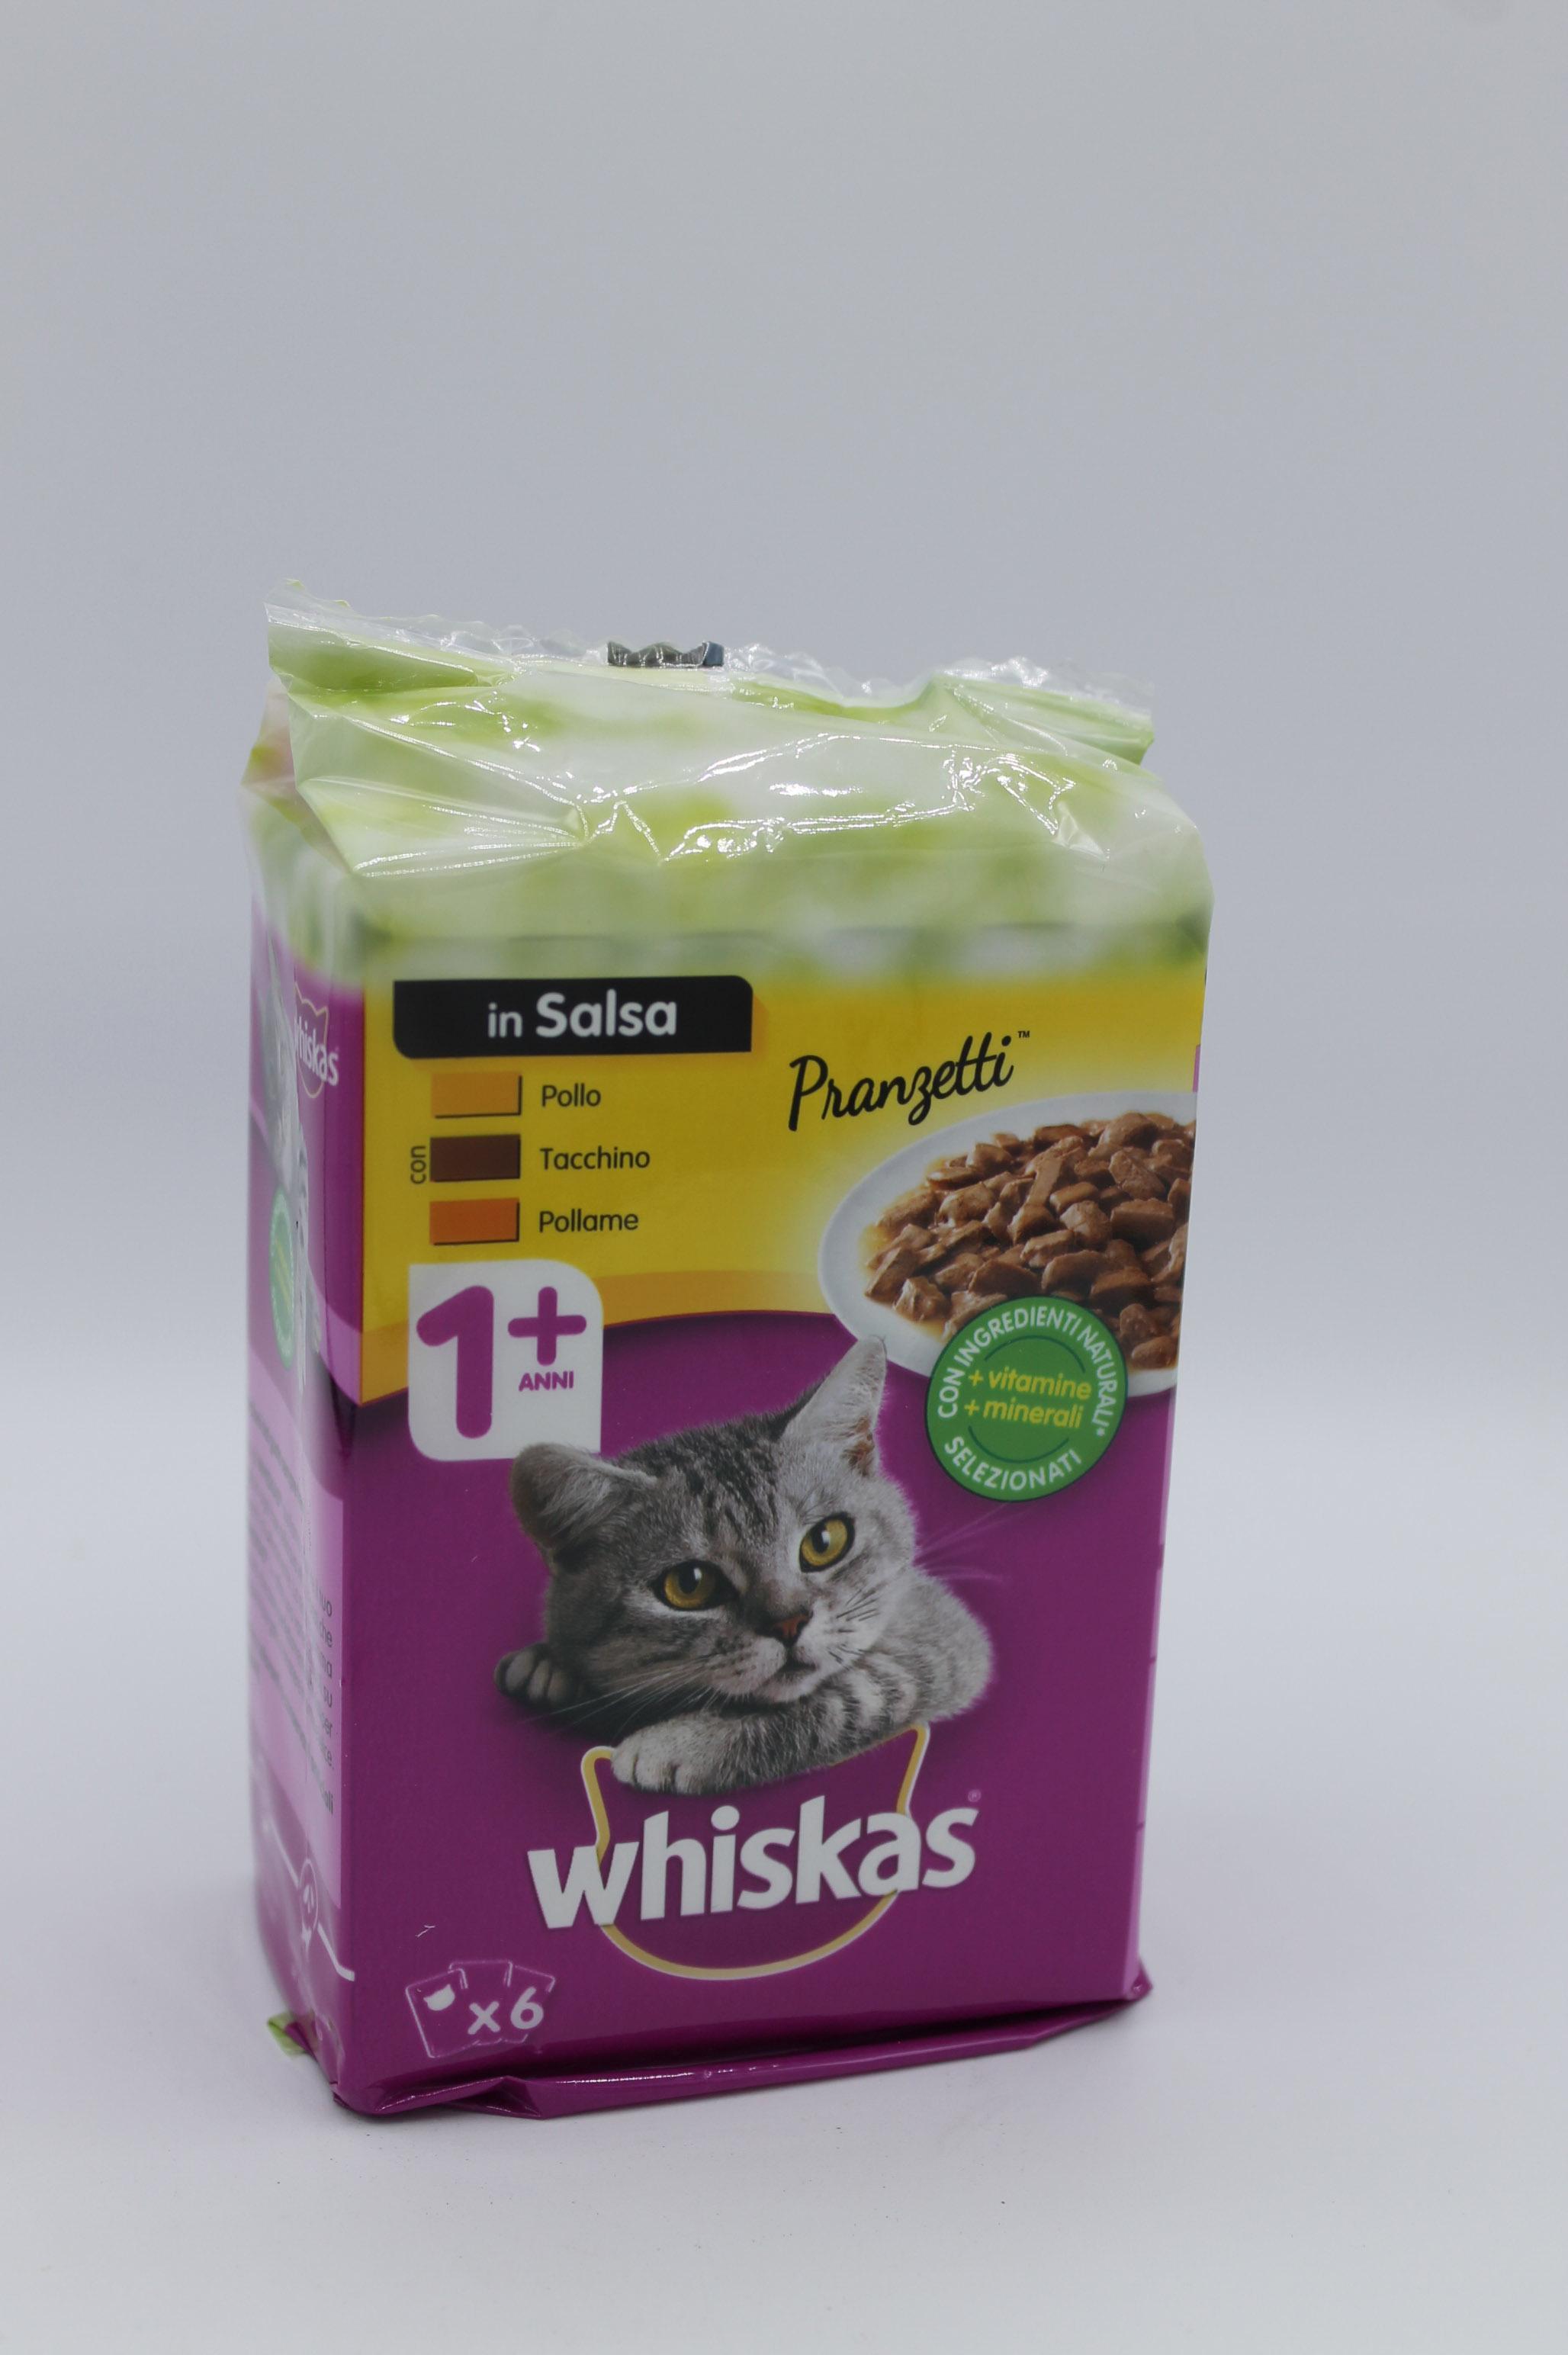 Whiskas pranzetti gatto 6X50gr vari gusti.